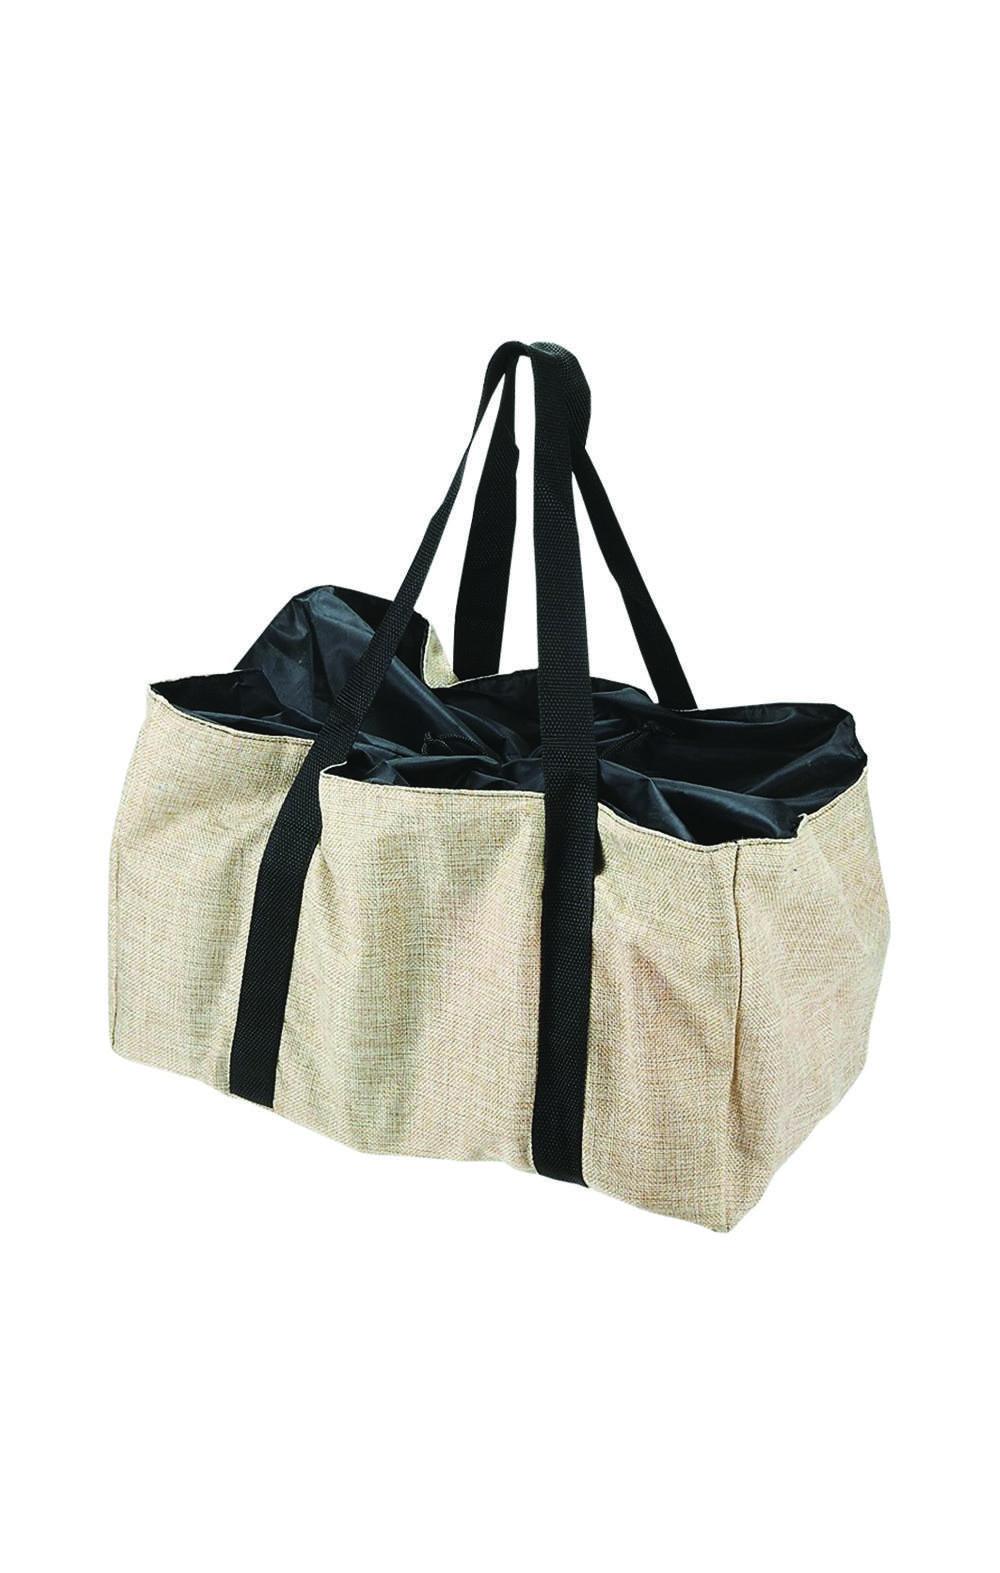 Pearl Metal D-6504 Marquee Regicago Bag Denim حقيبة متعددة الأستخدام